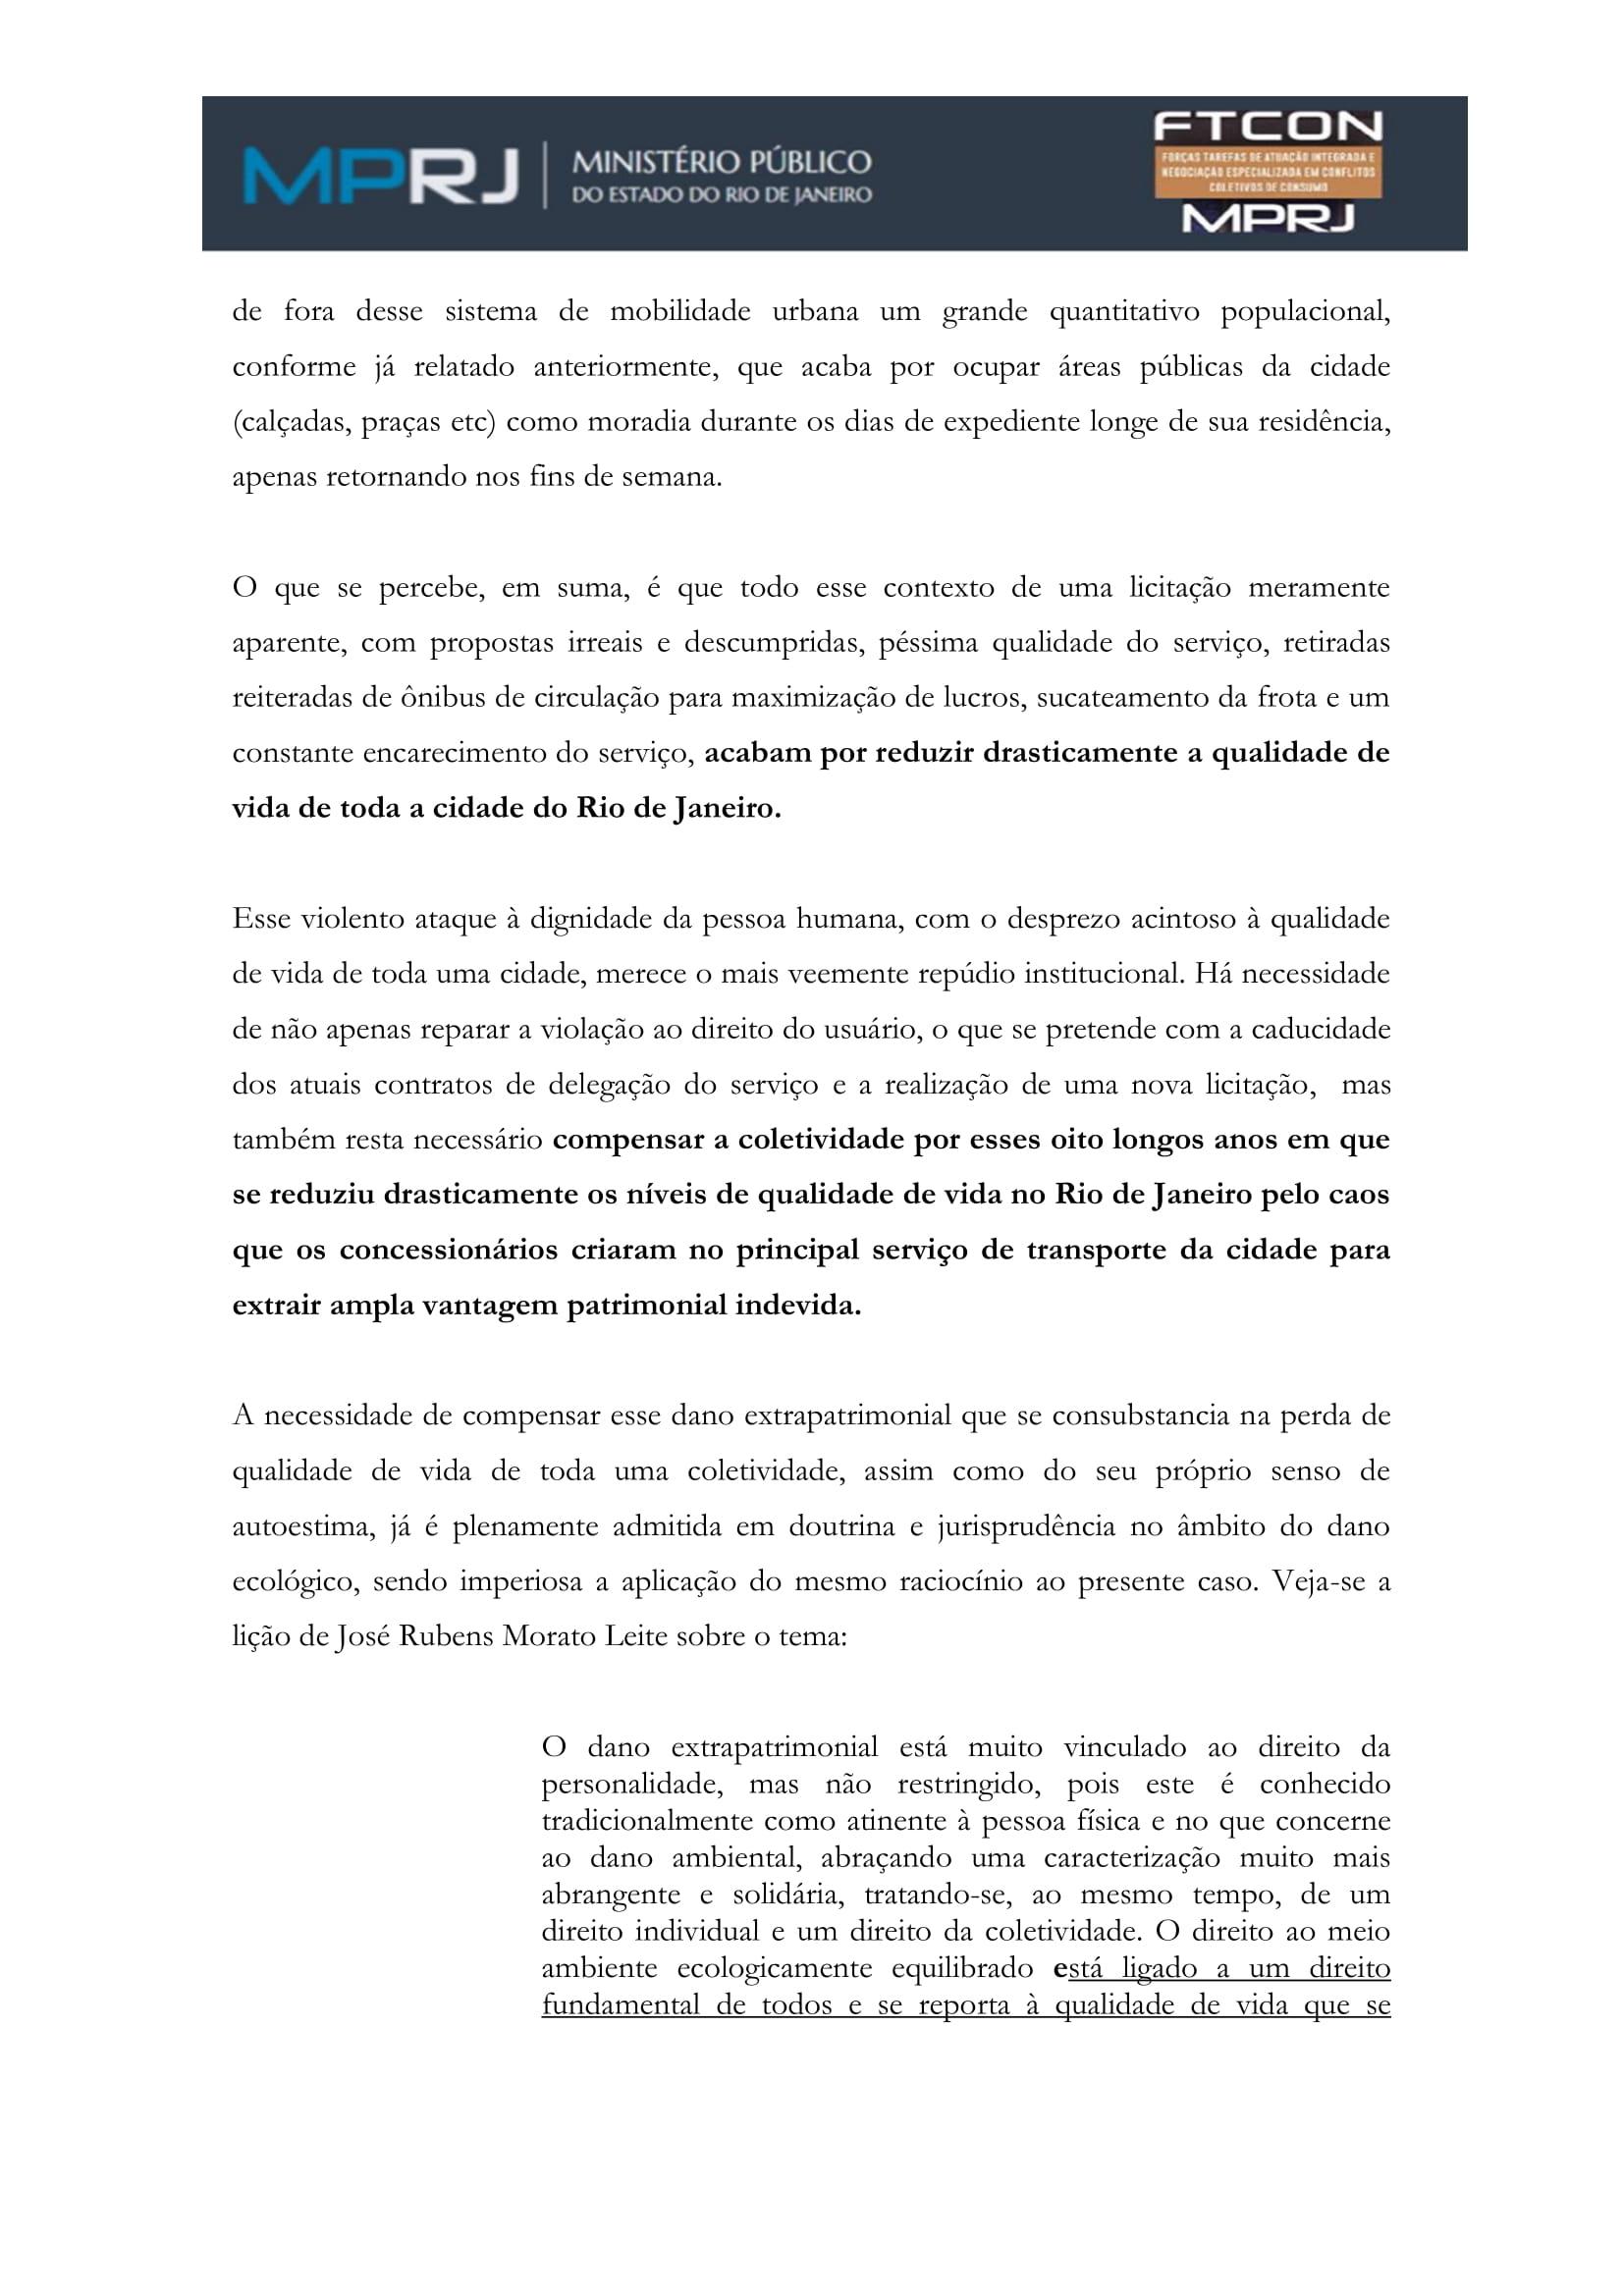 acp_caducidade_onibus_dr_rt-129